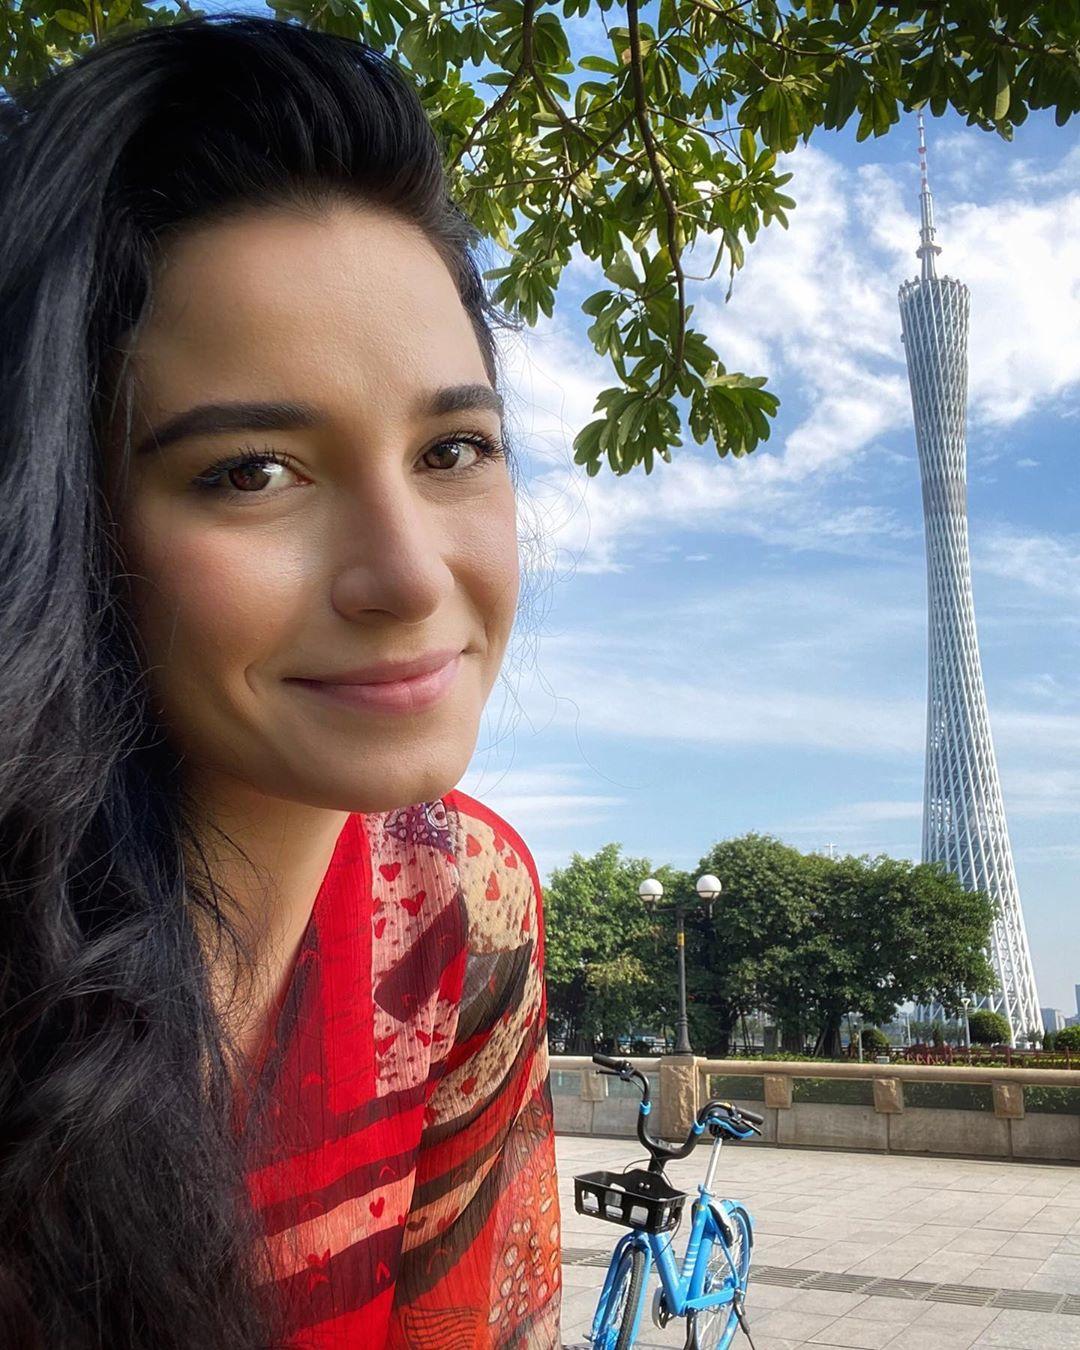 julia gama, miss brasil universo 2020/top 11 de miss world 2014. - Página 3 10626510